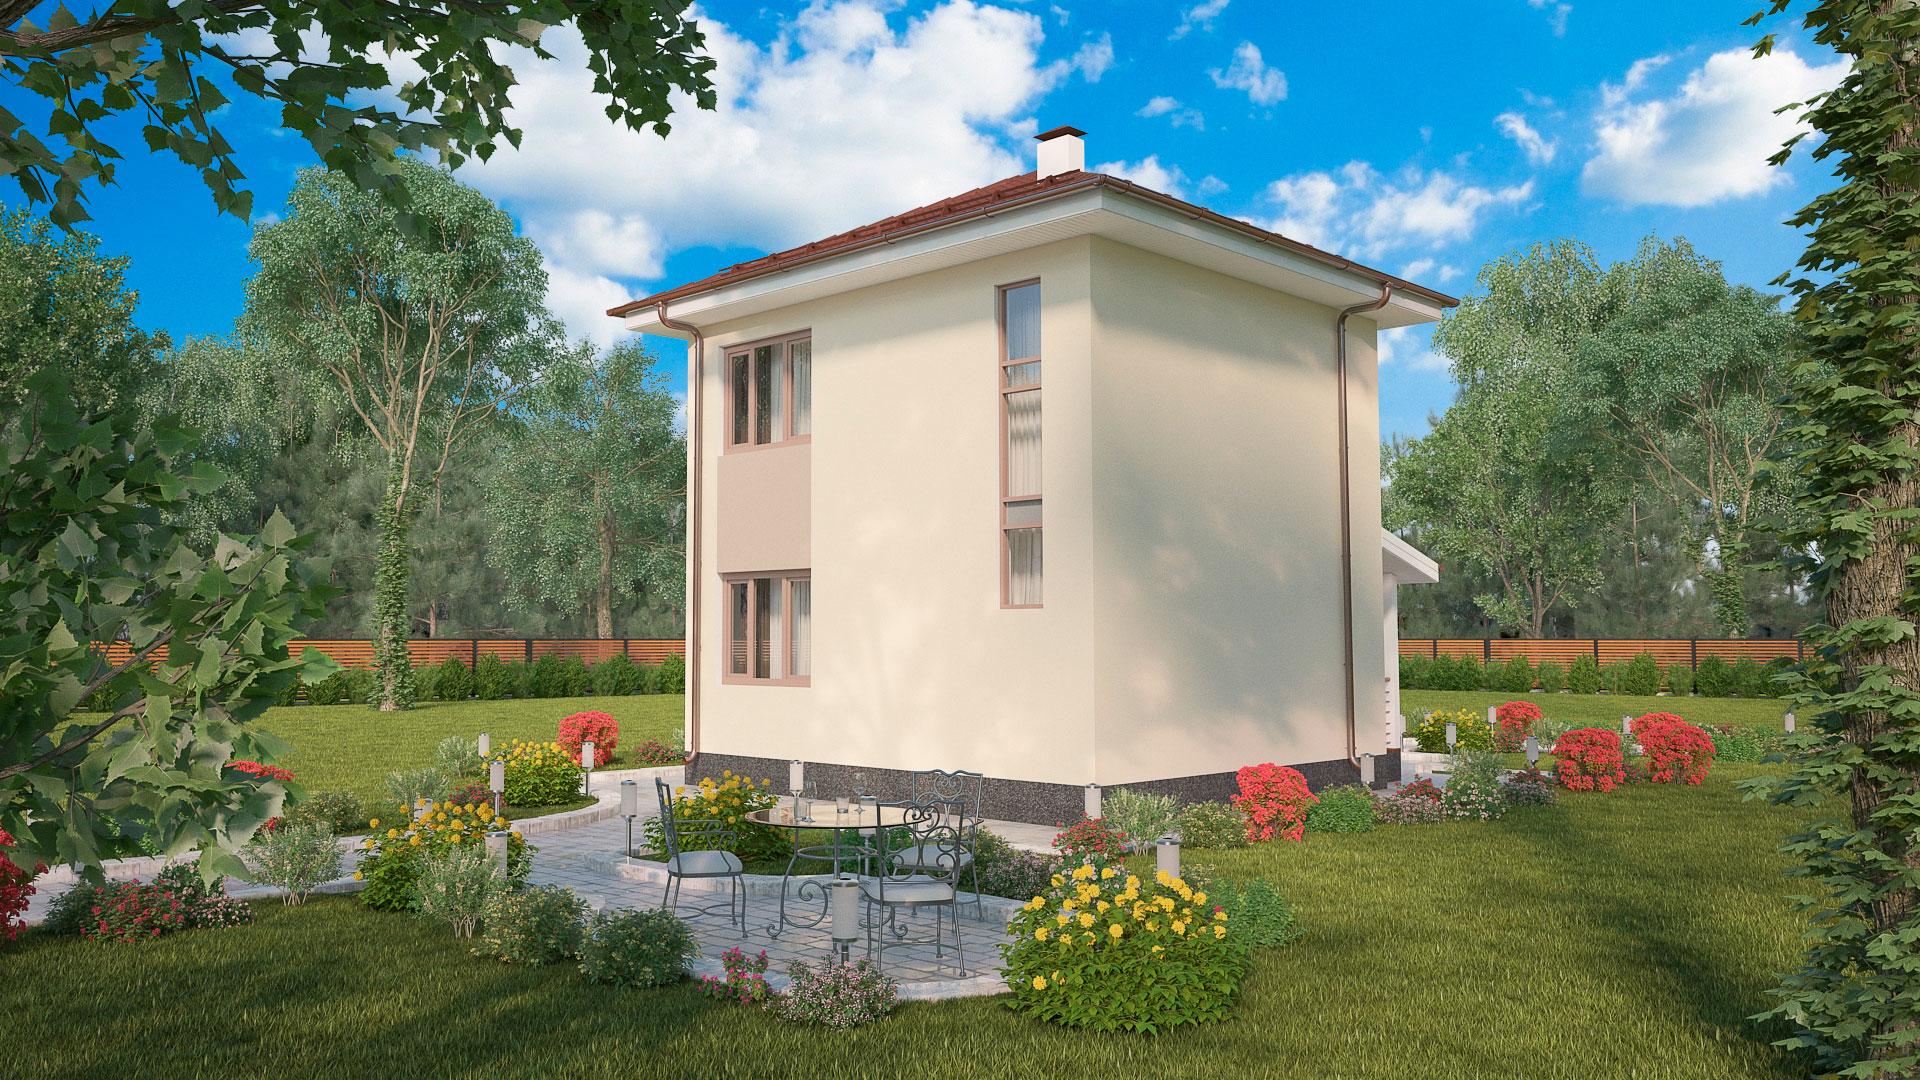 Боковой фасад двухэтажного дома БЭНПАН, проект МС-69.